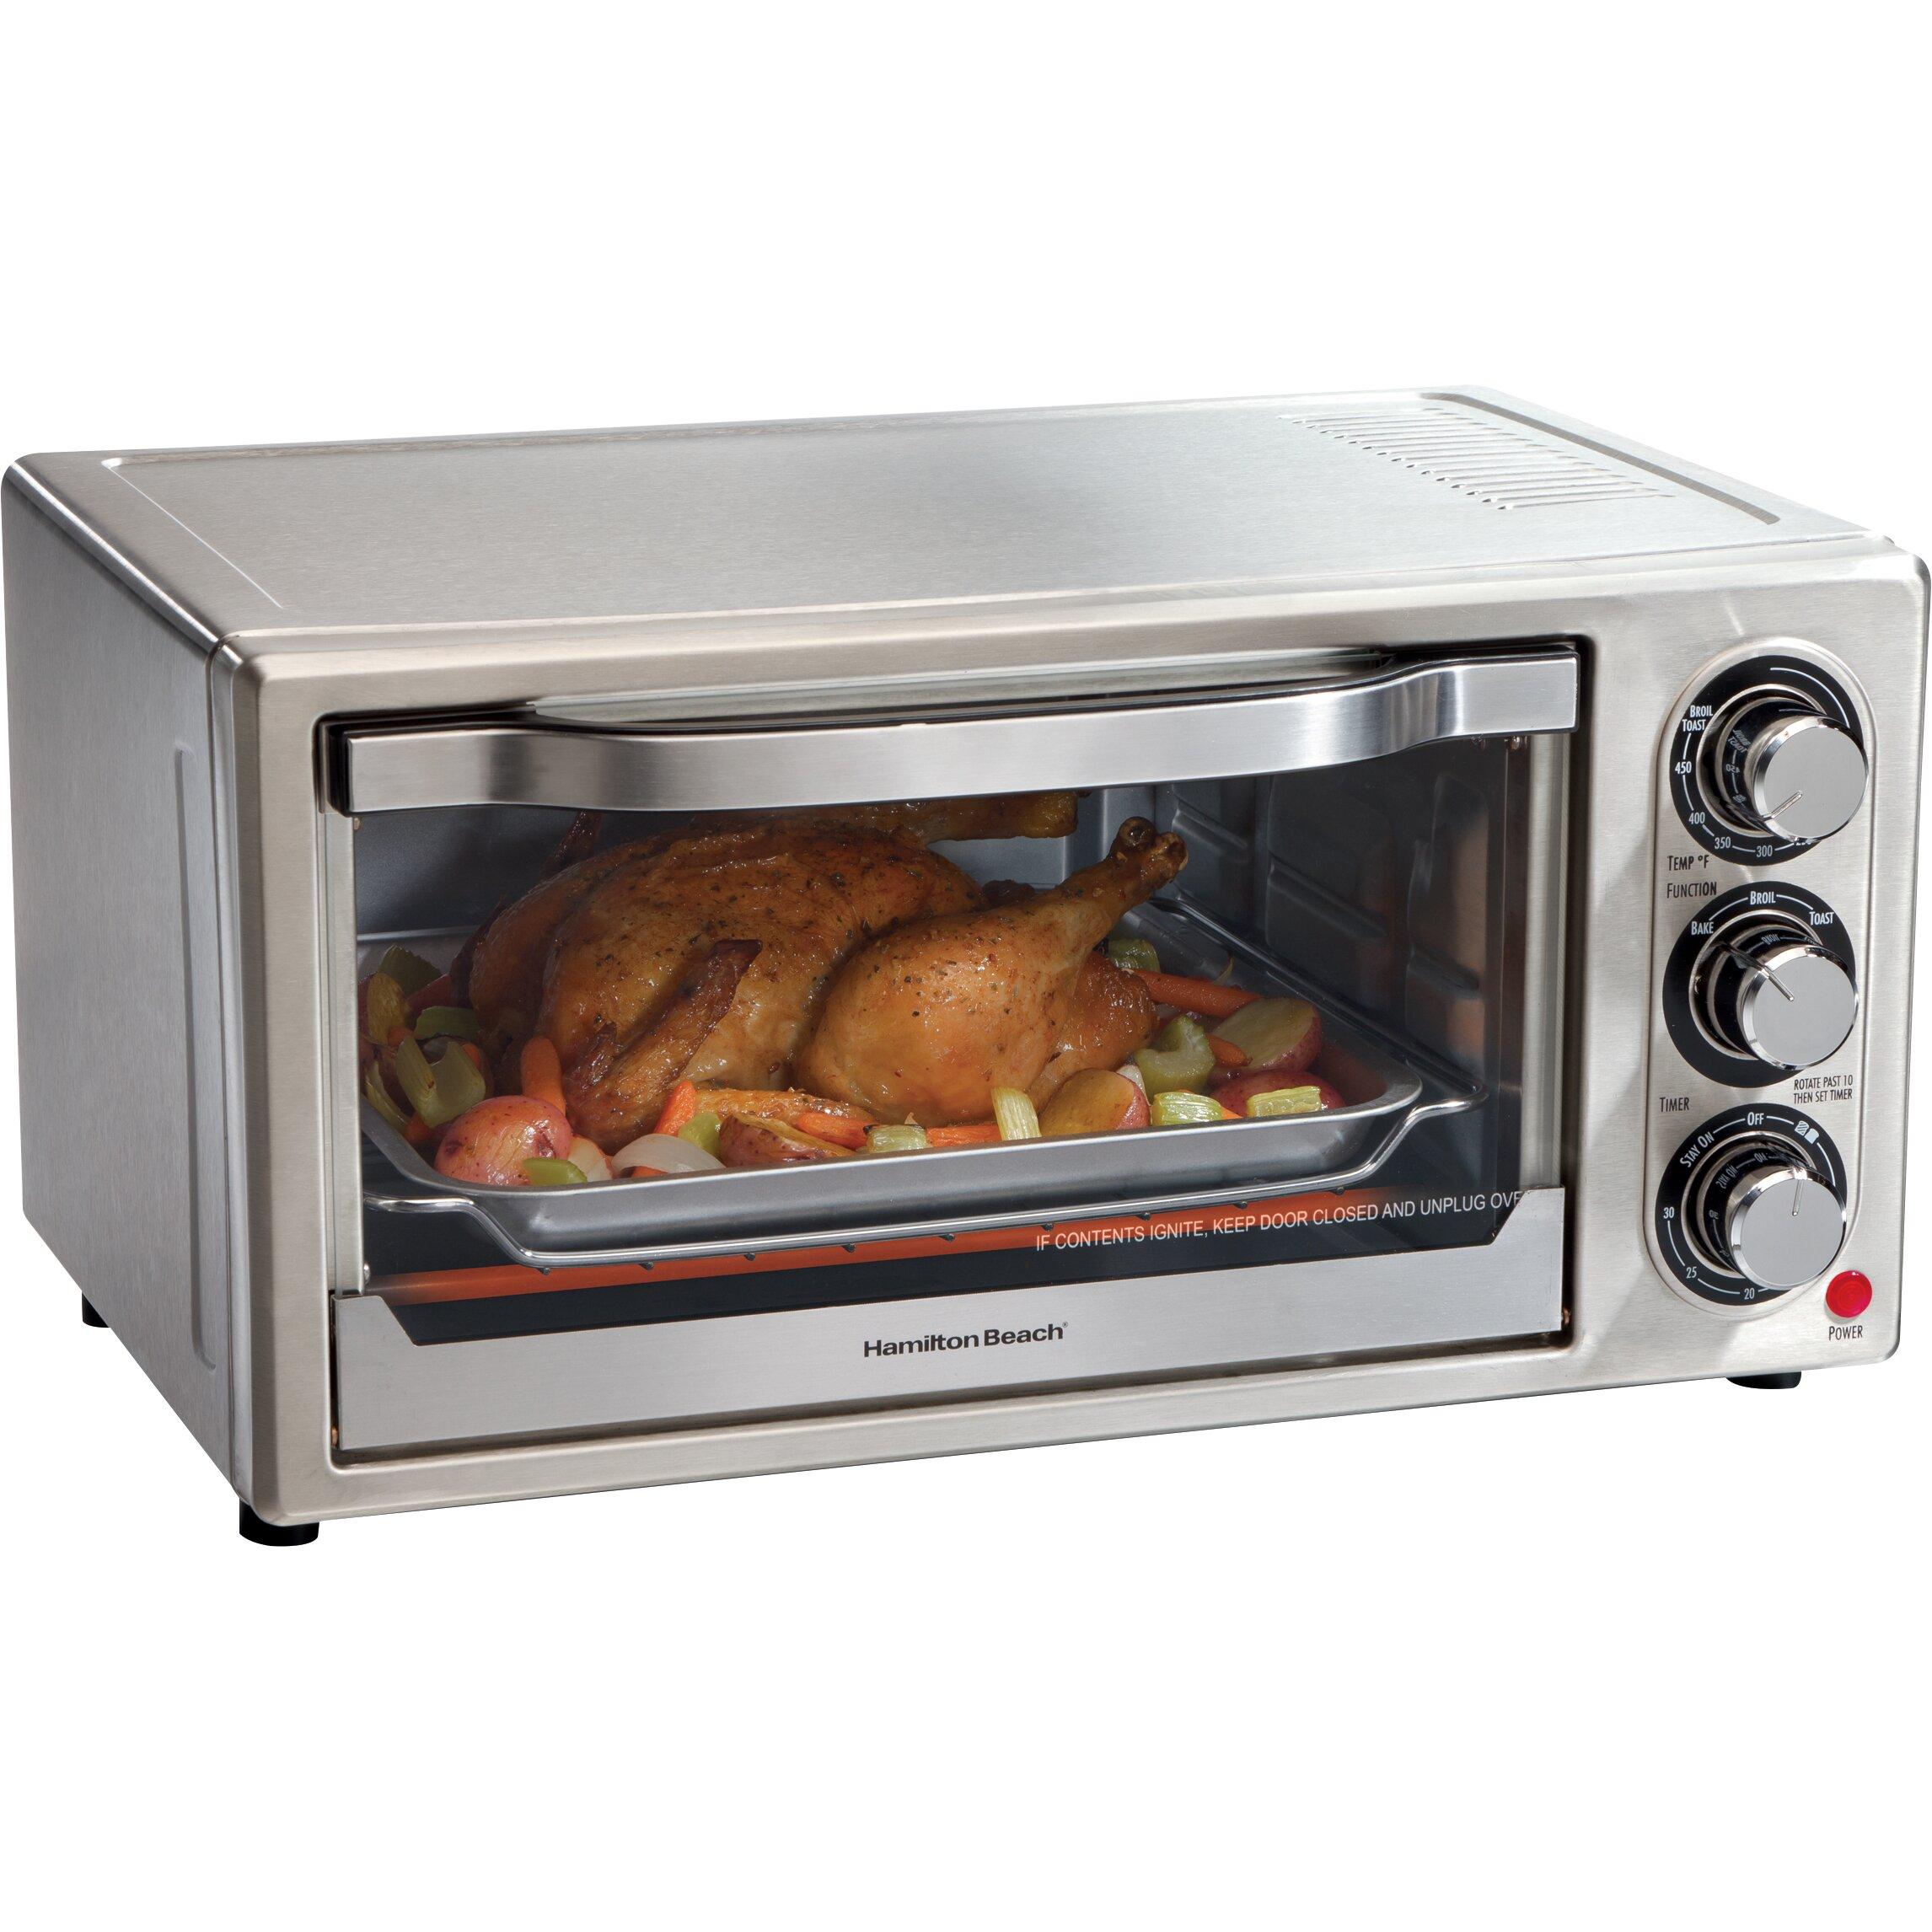 Under the cabinet toaster oven - Hamilton Beach Toaster Oven